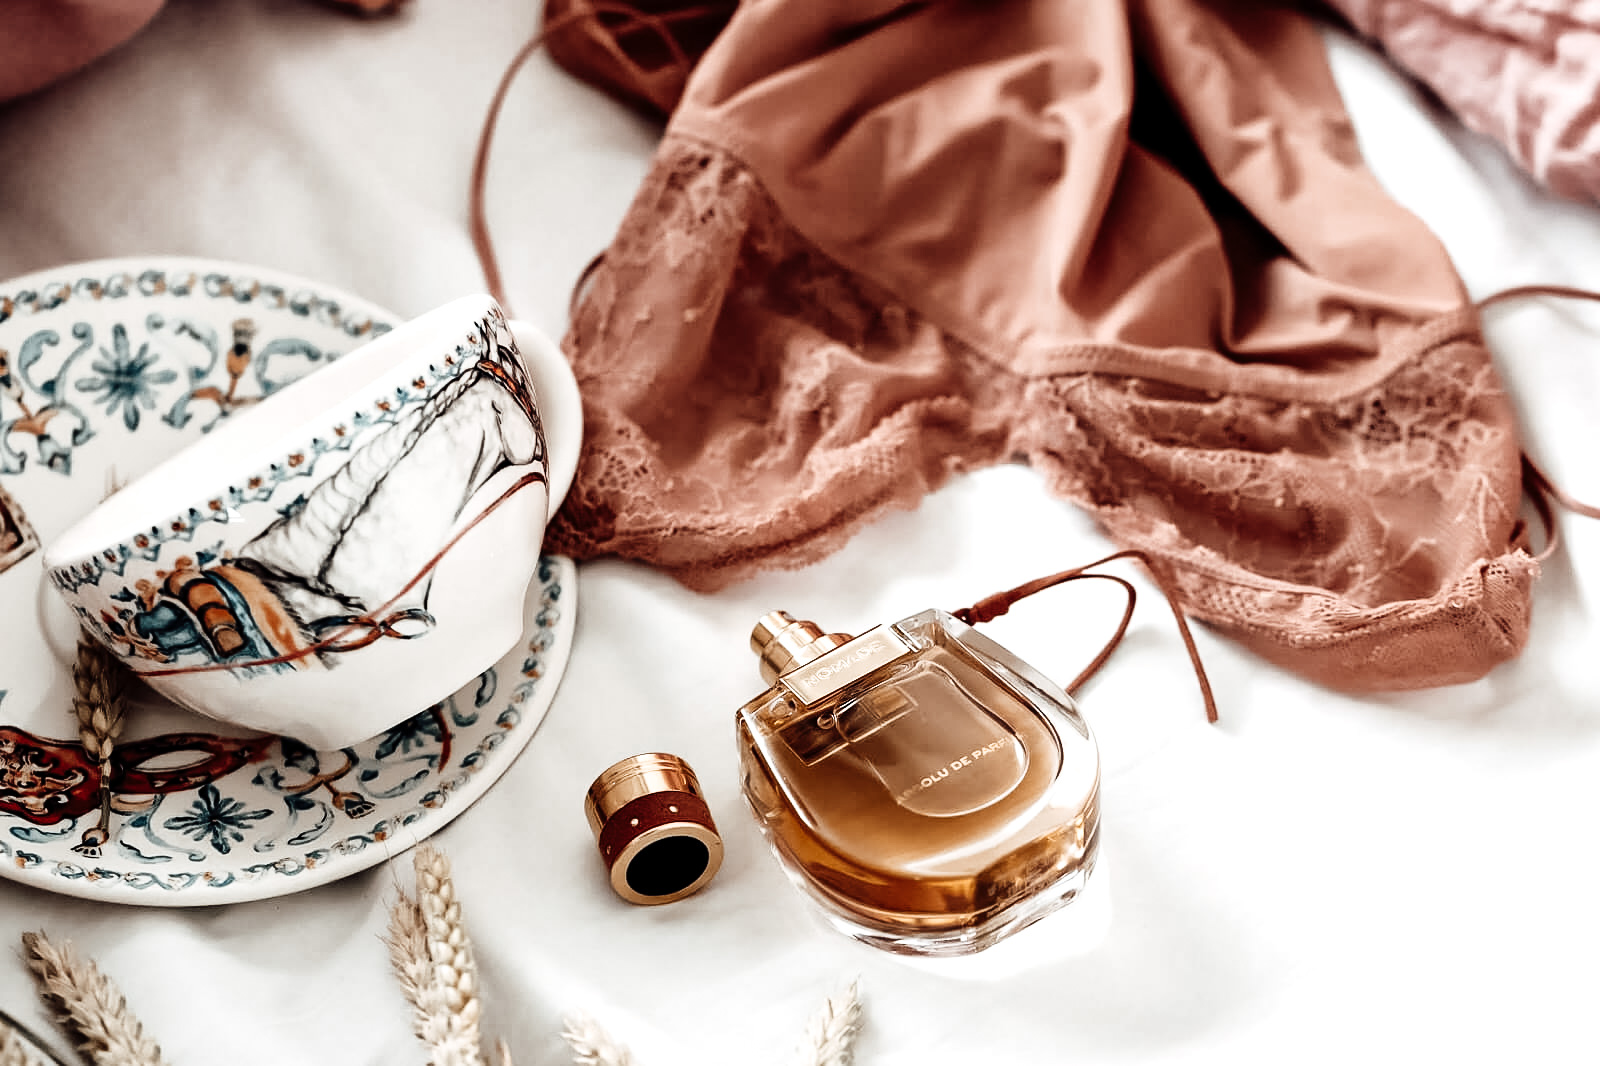 chloé nomade absolu de parfum critique